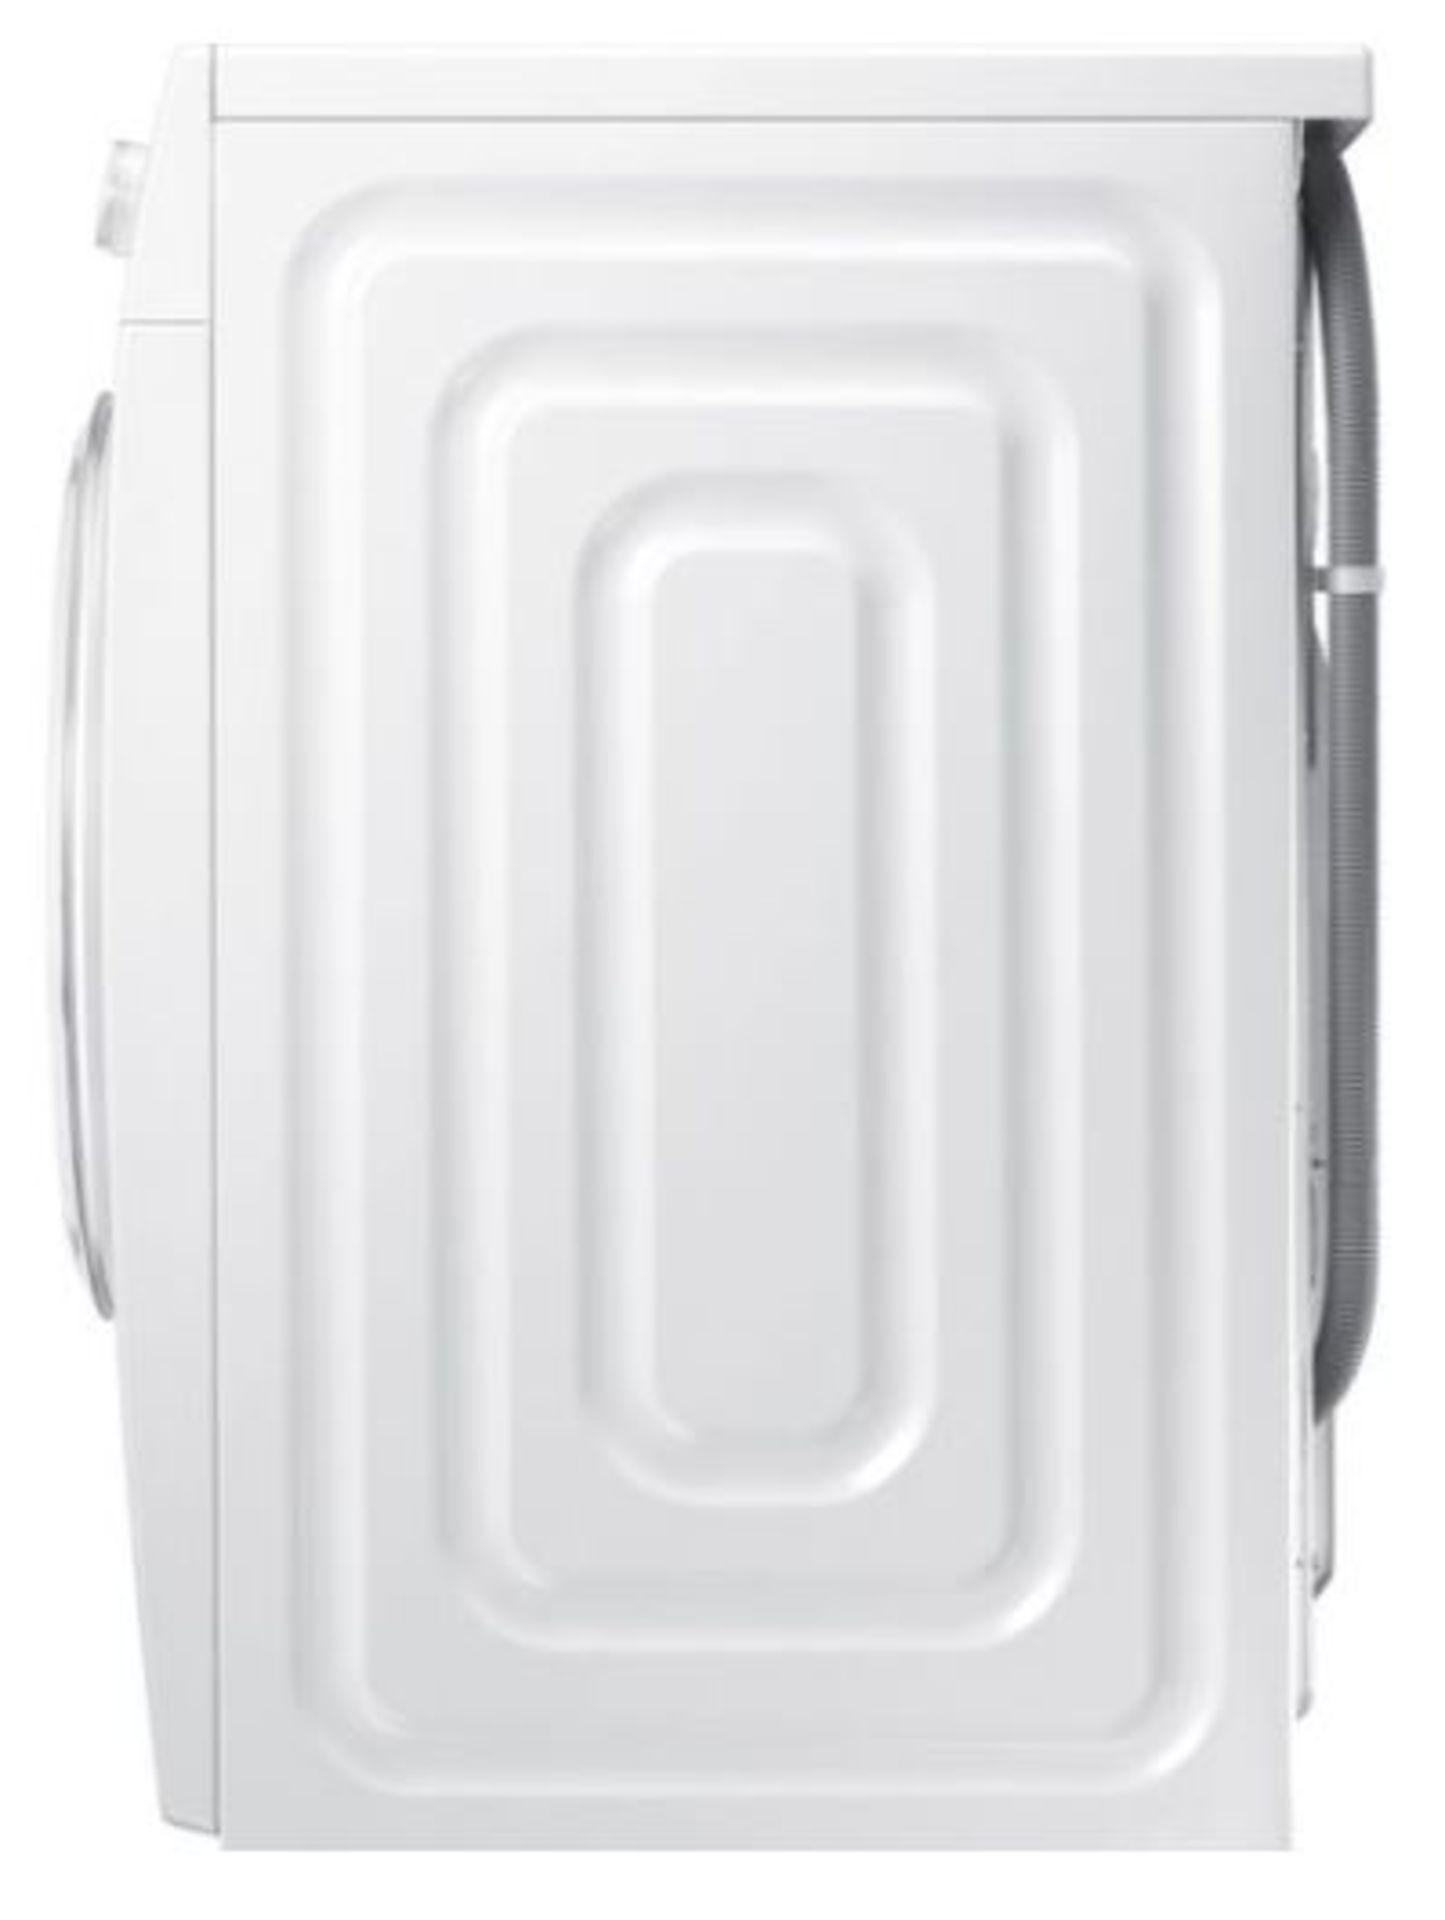 Pallet of 2 Samsung Premium Washing machines. Total Latest selling price £678* - Image 2 of 9